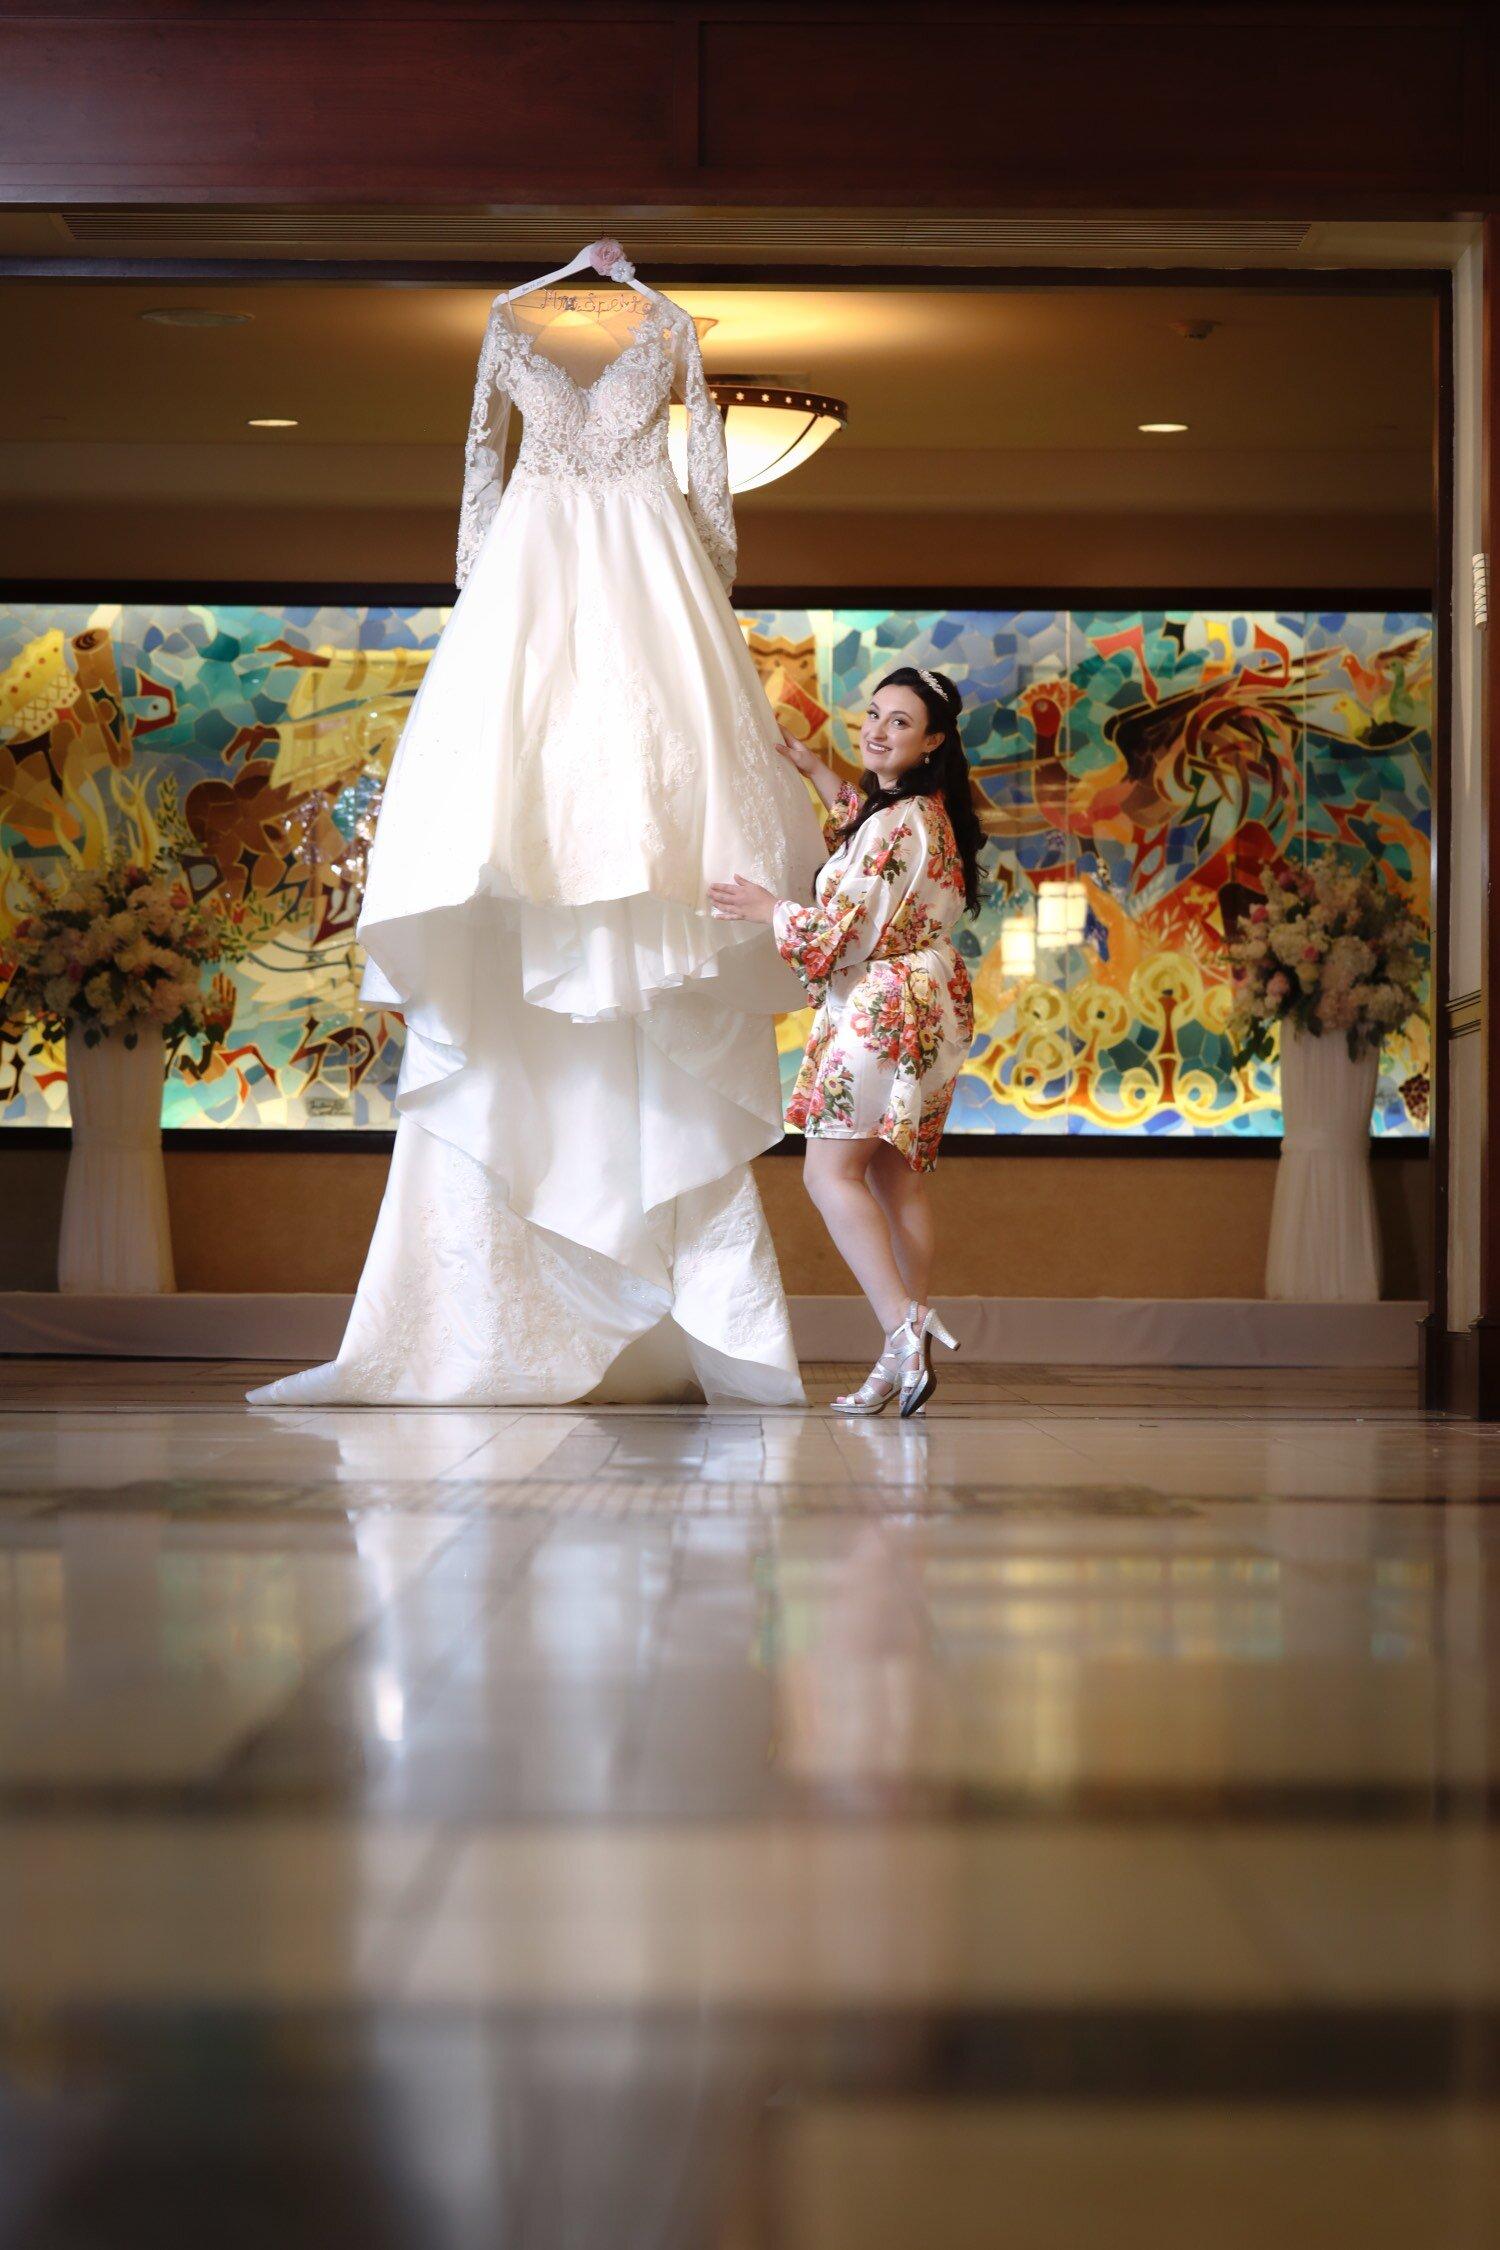 LightMaster_Studios-Curvy-bride-ad-unedited-1333.jpeg